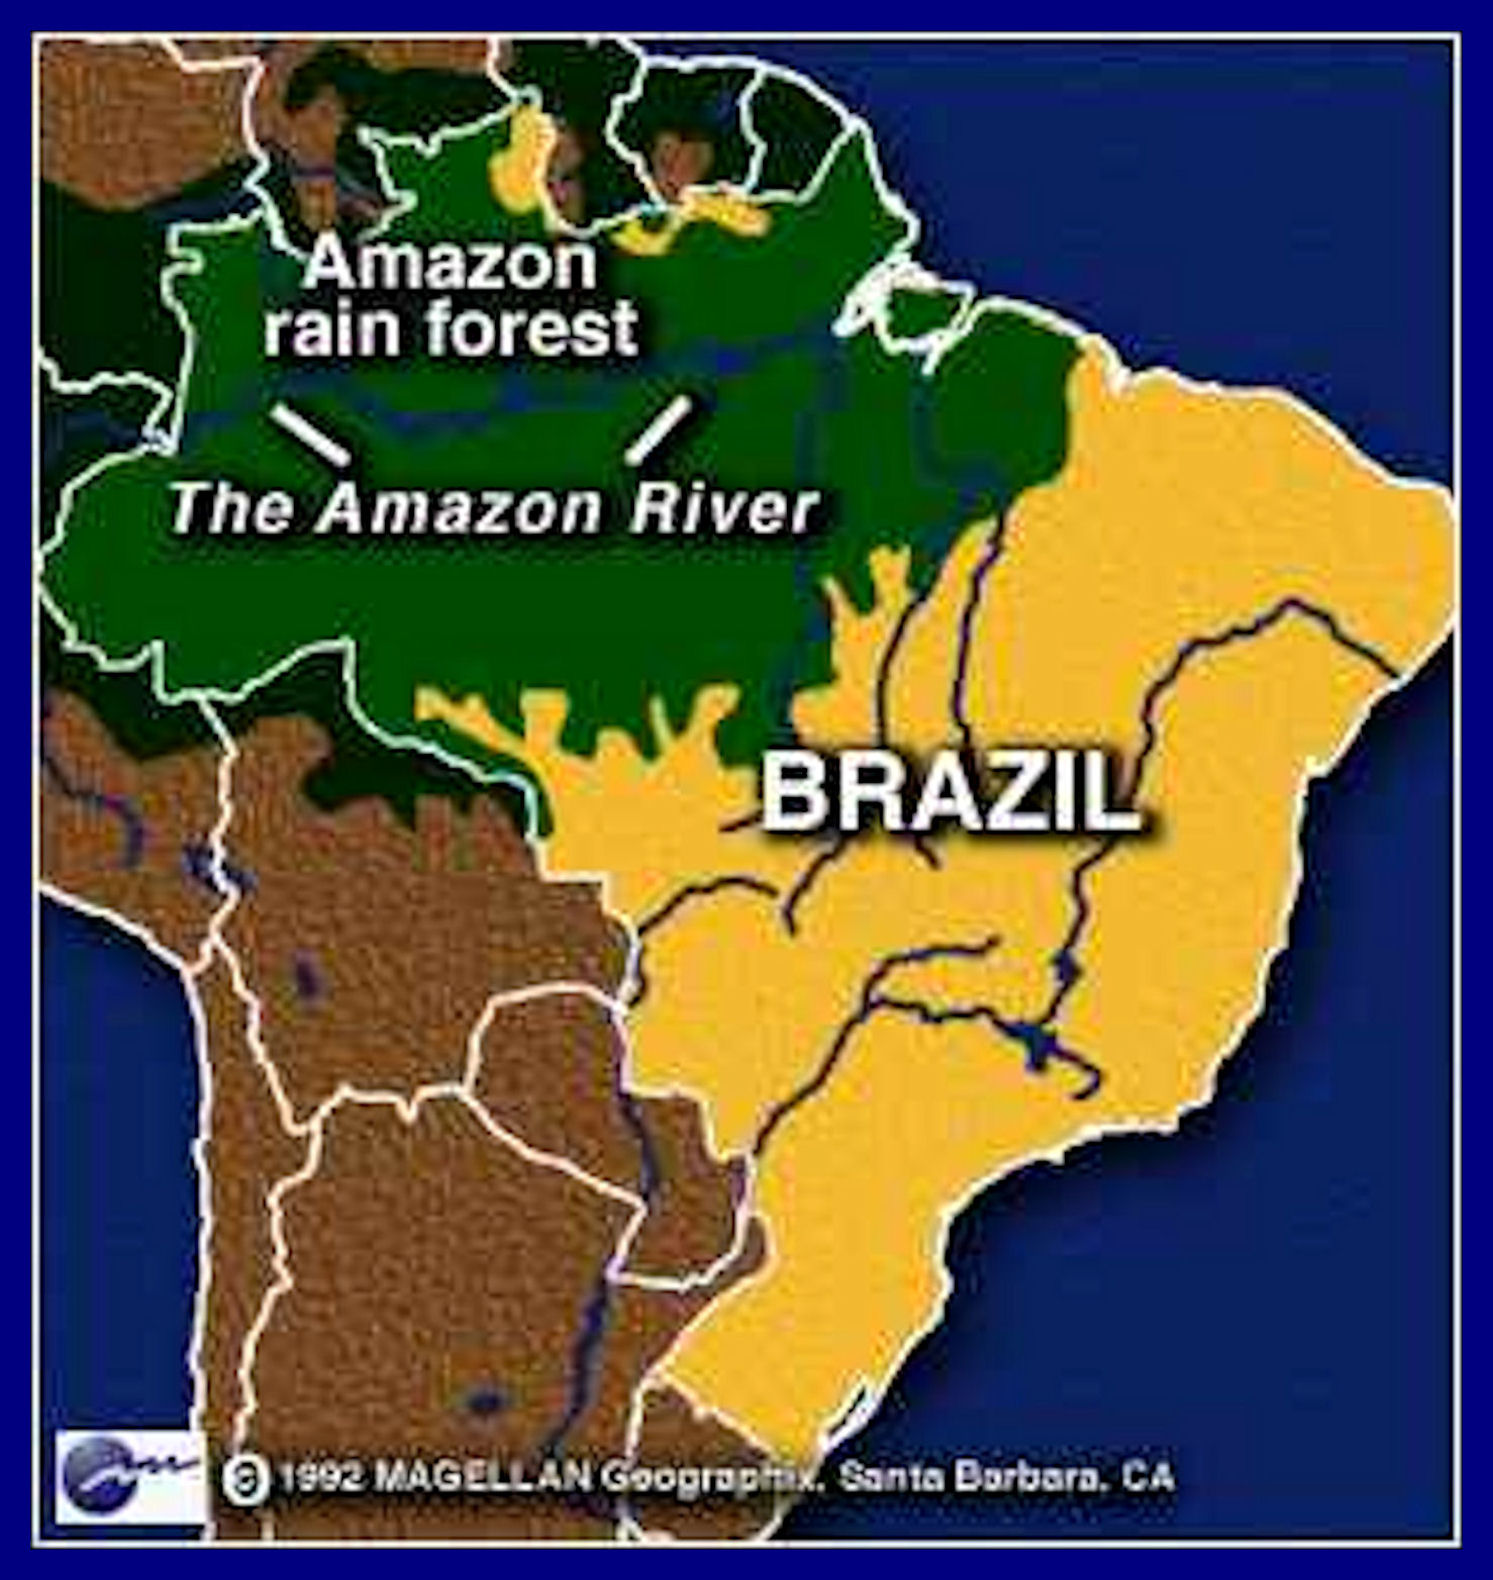 APES Amazon Rainforest on emaze